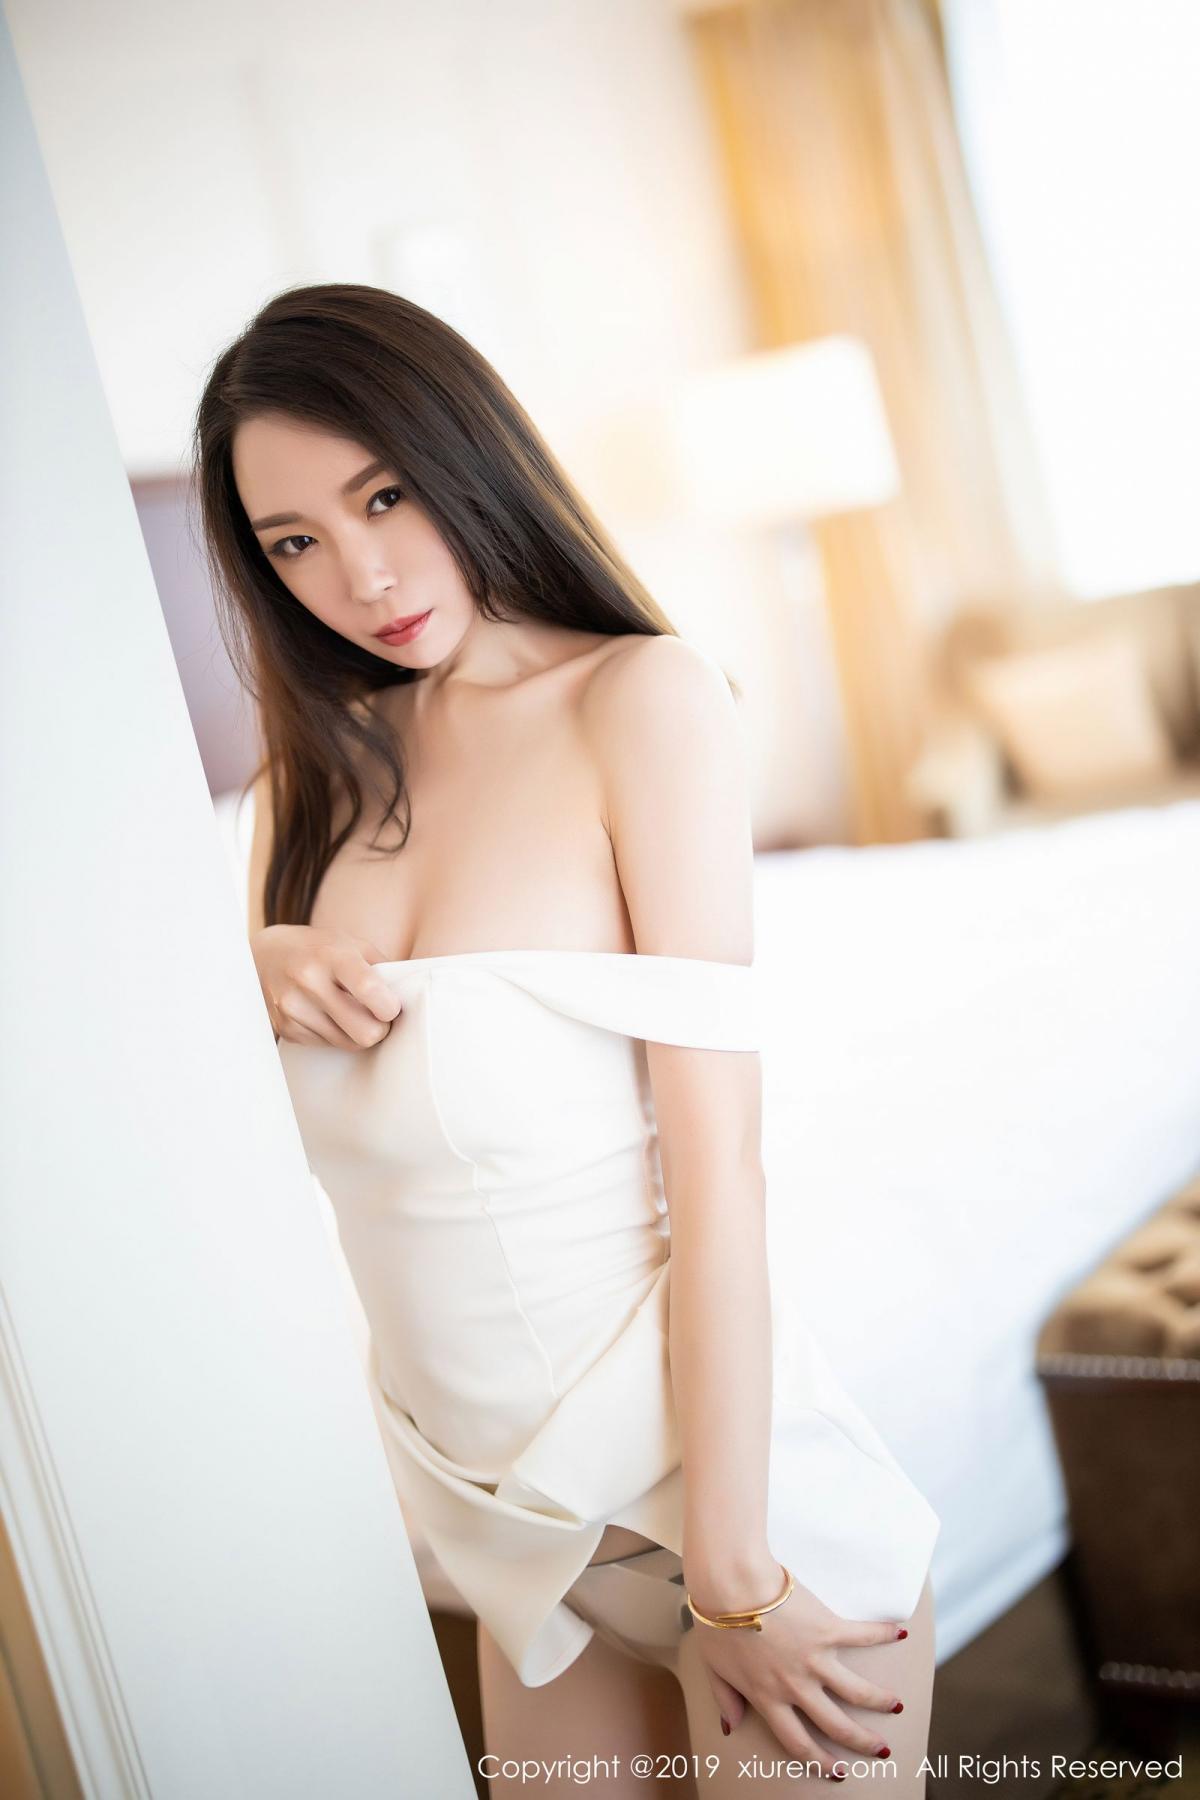 [XiuRen] Vol.1861 Meng Xin Yue 72P, Meng Xin Yue, Tall, Temperament, Uniform, Xiuren